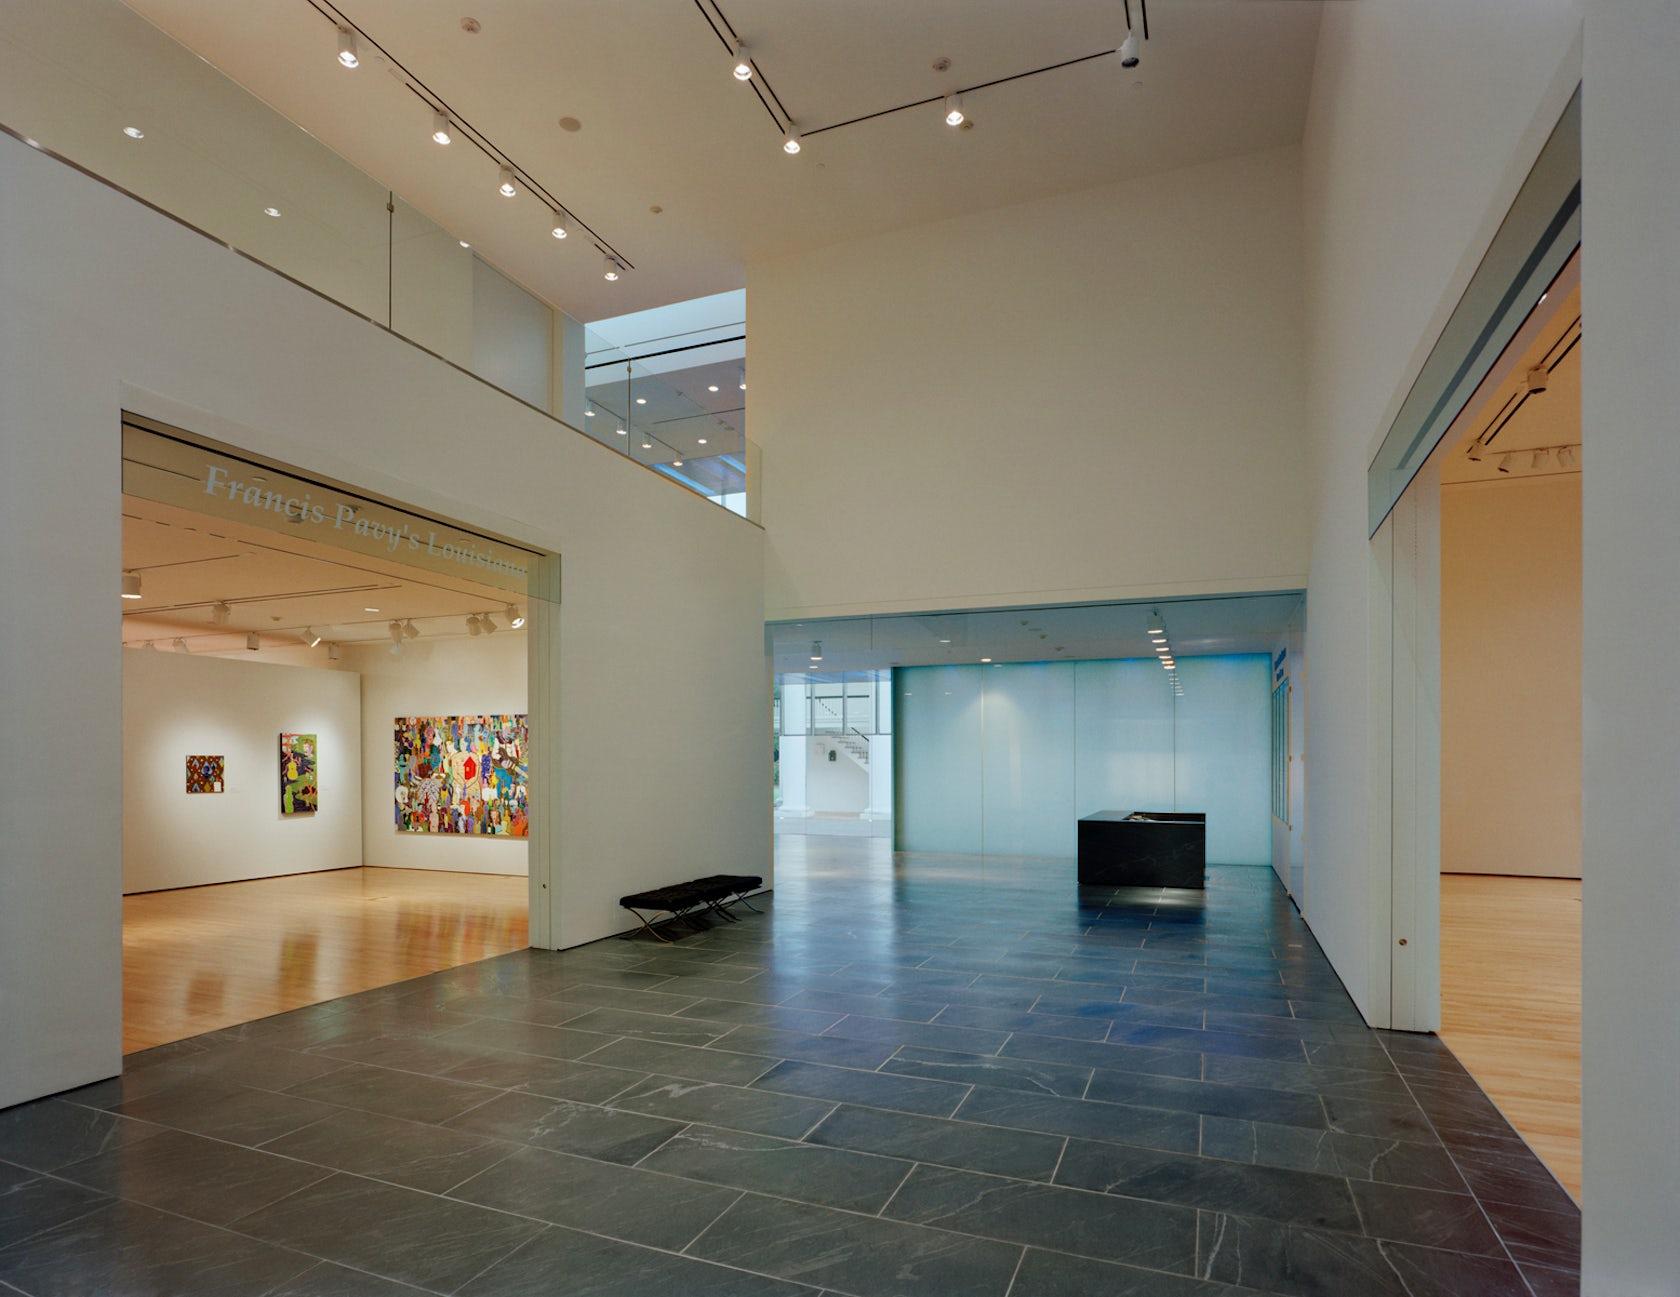 St Paul Park Auto >> Paul and Lulu Hilliard University Art Museum - Architizer